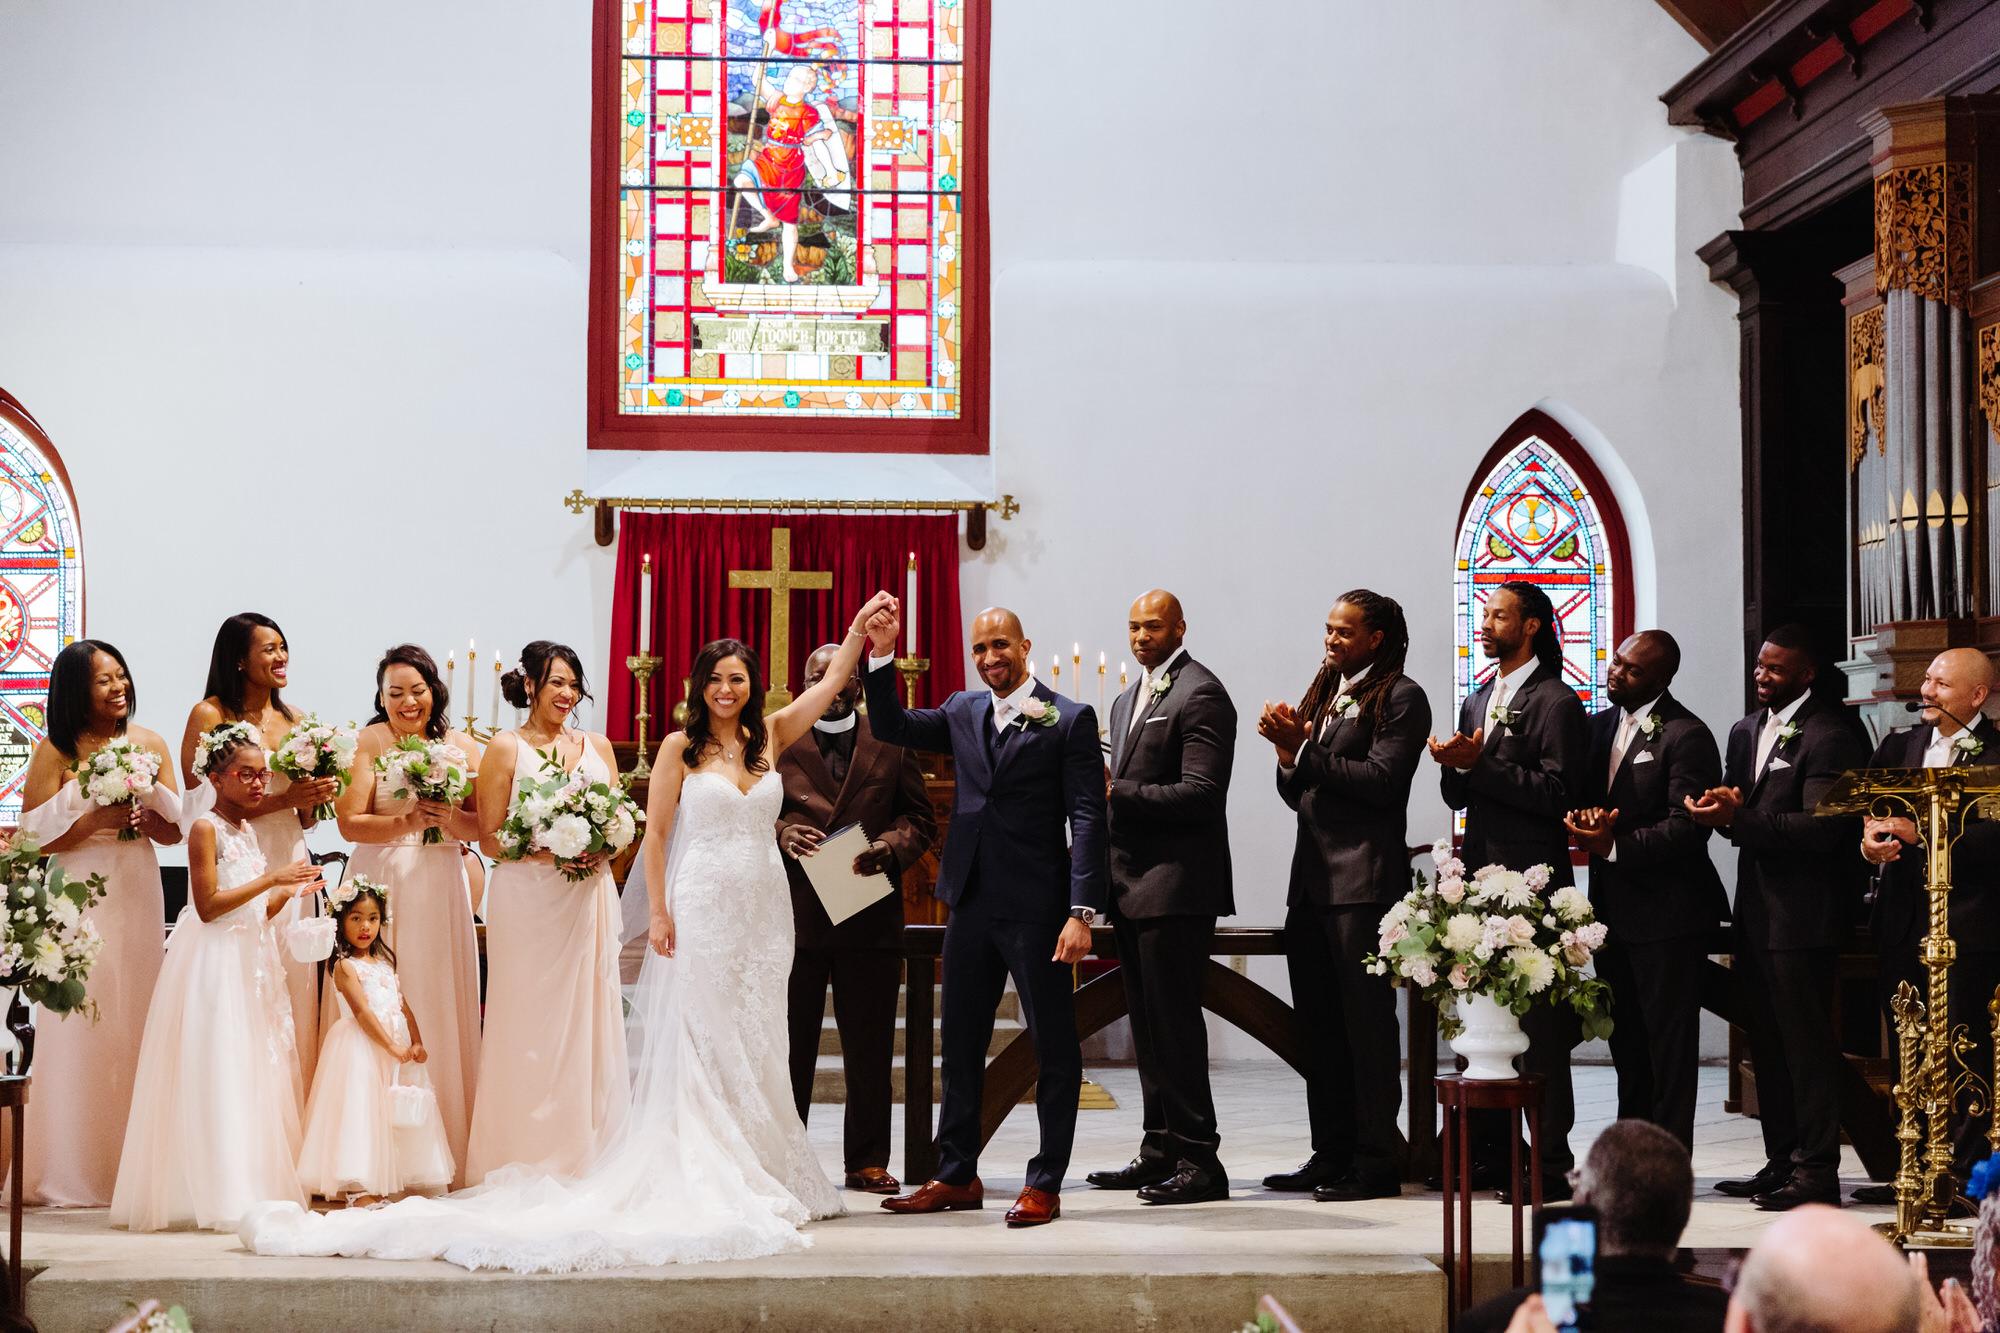 st-lukes-chapel-cannon-green-charleston-wedding-928.JPG